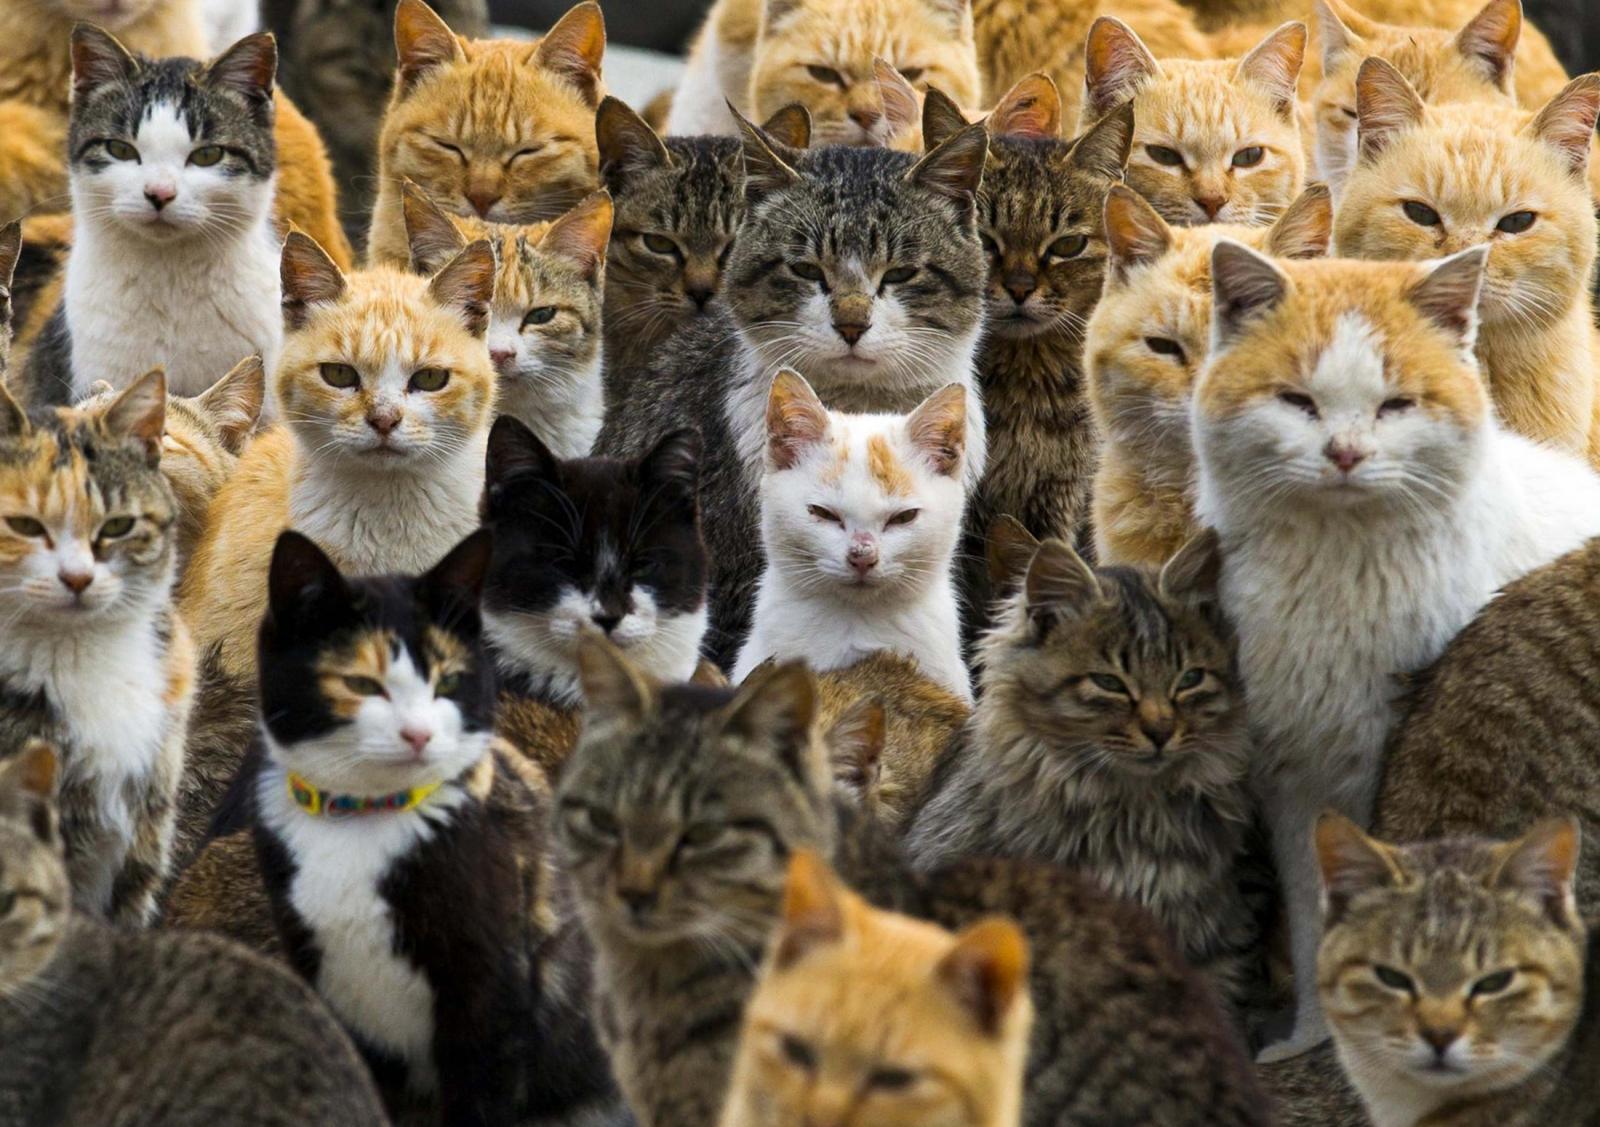 Australia feral cats